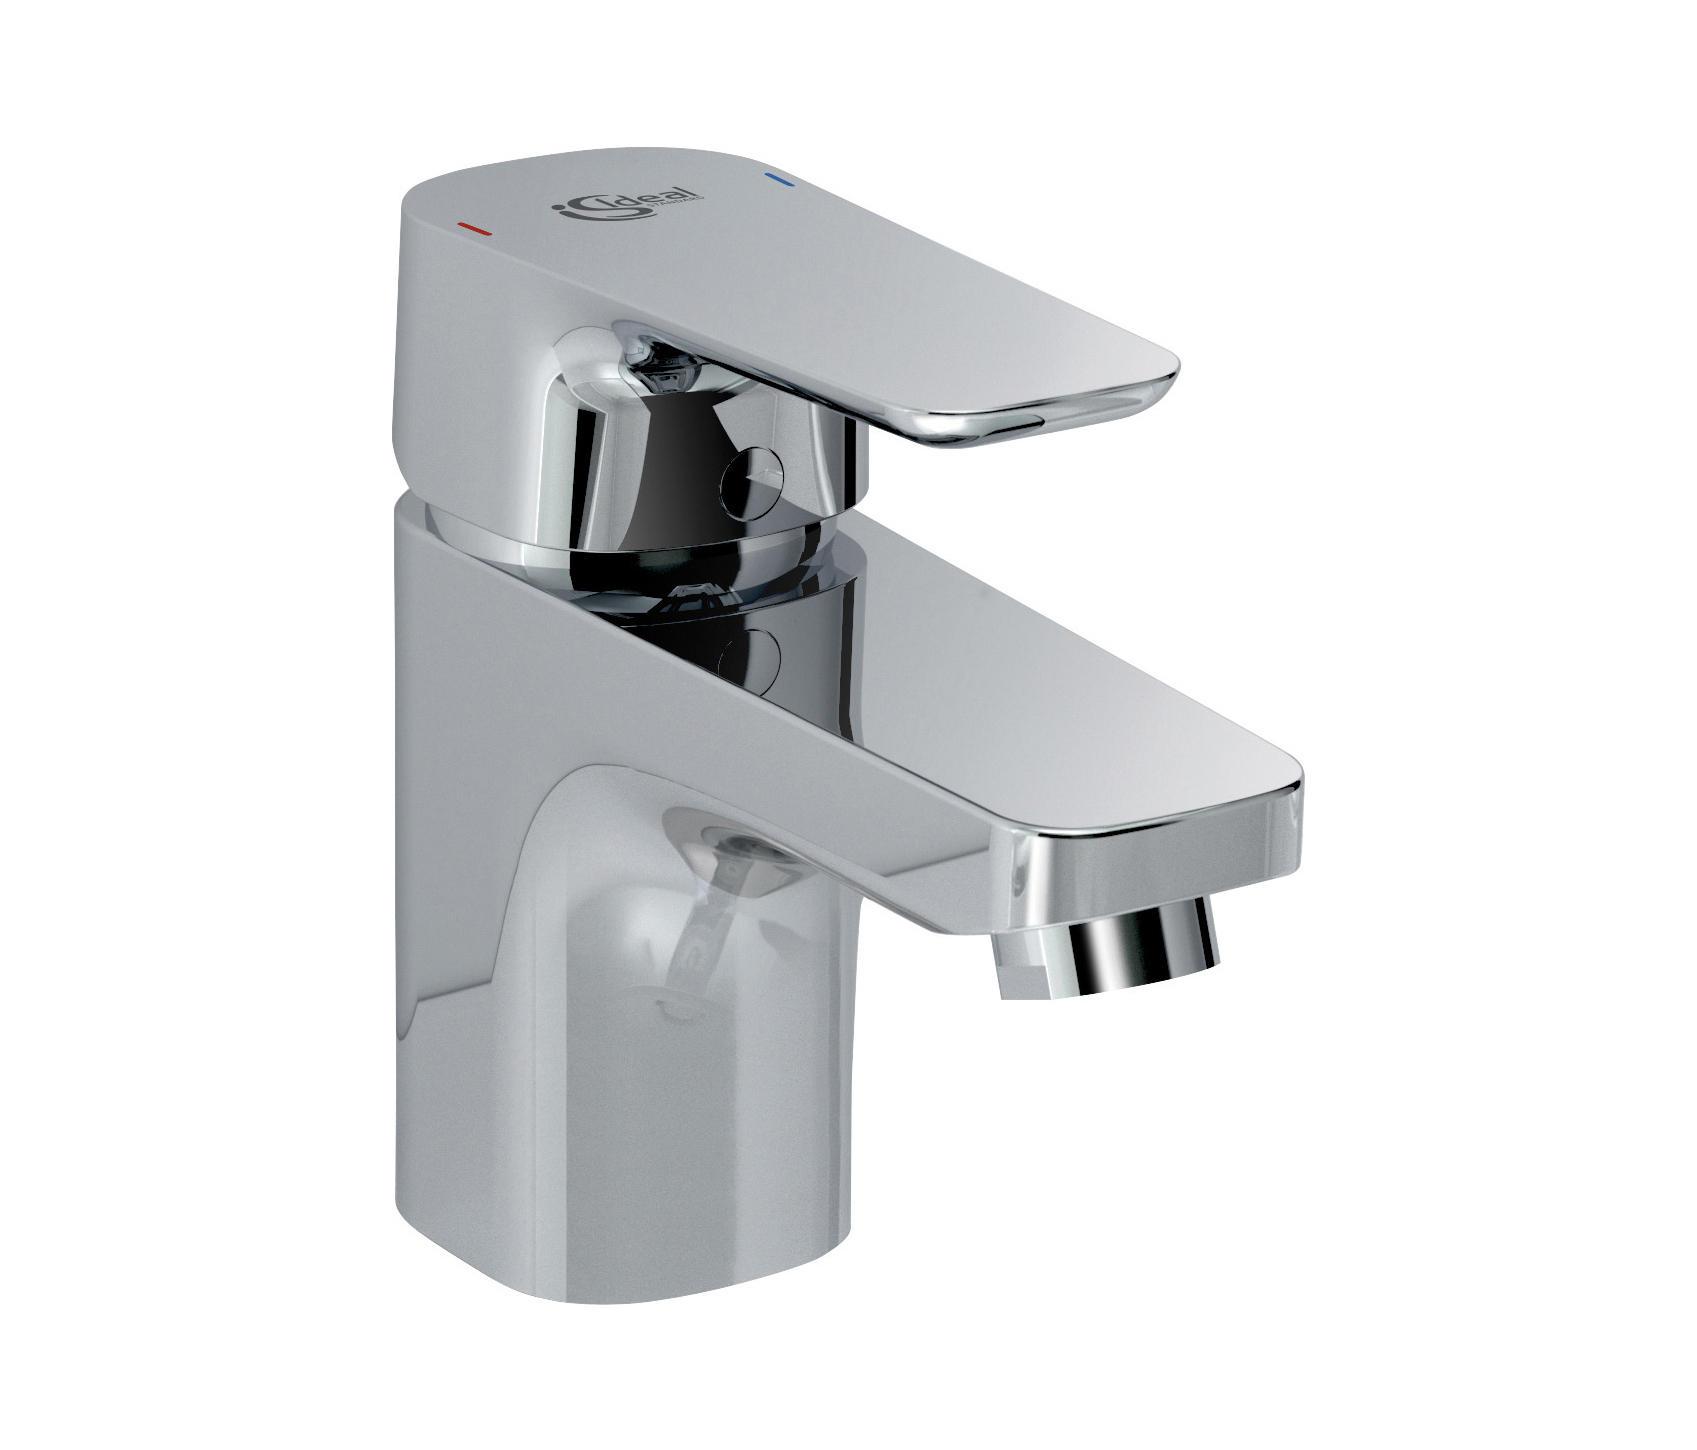 ceraplan iii waschtischarmatur 130 wash basin taps from. Black Bedroom Furniture Sets. Home Design Ideas